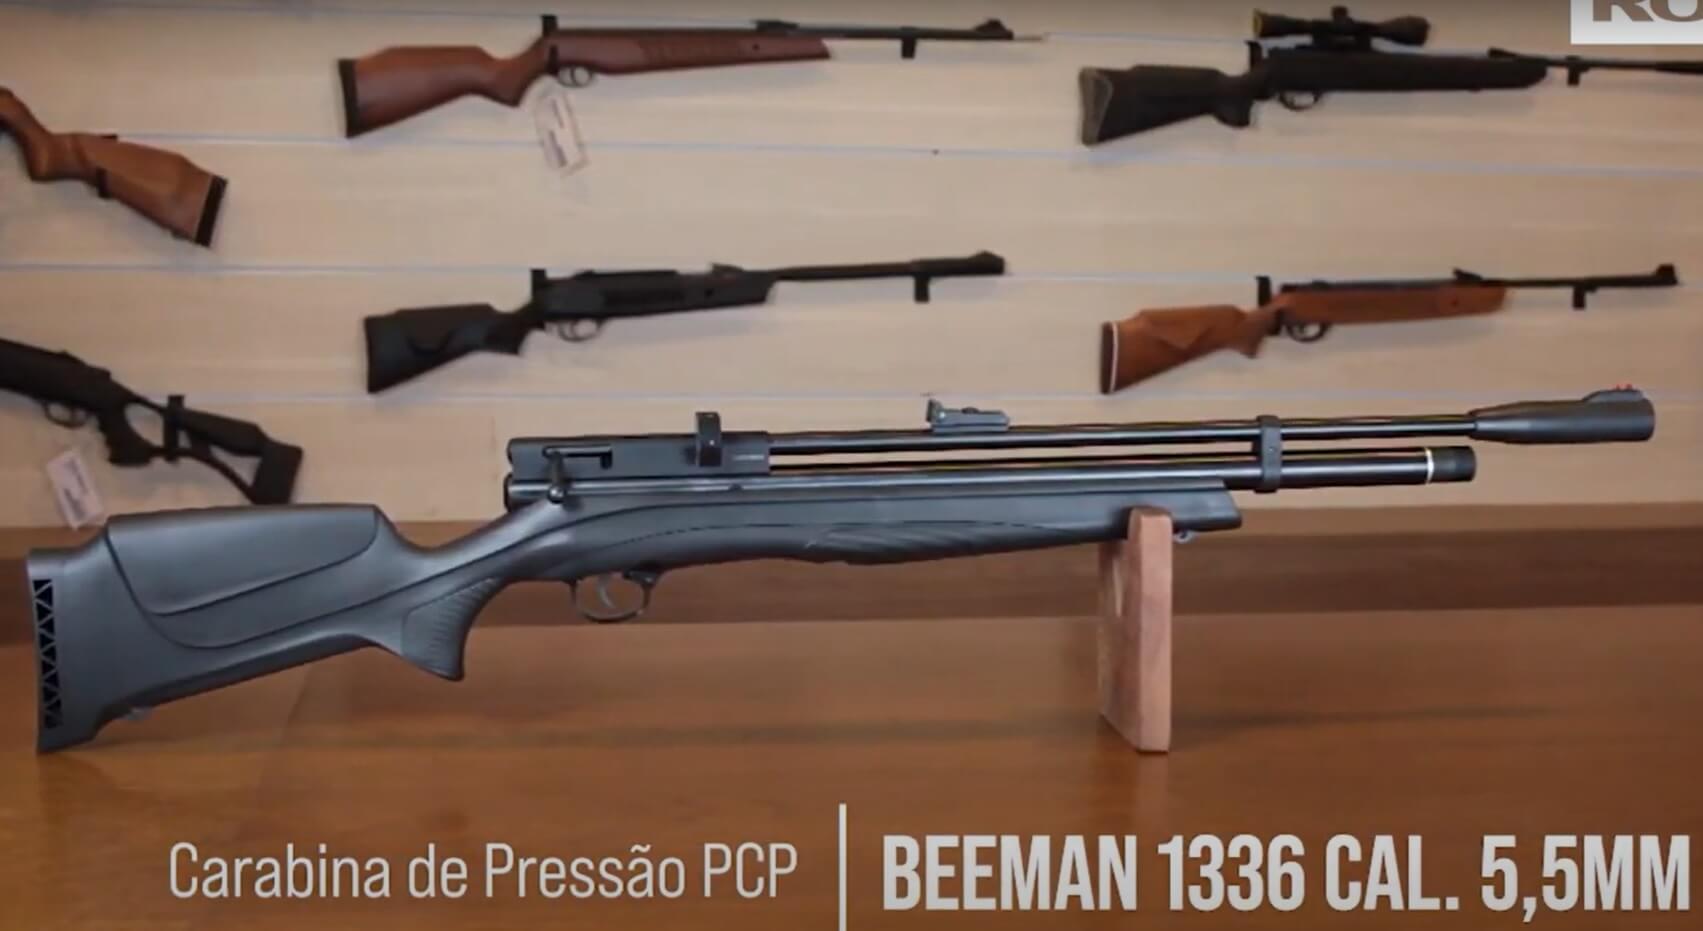 Consórcio - Carabina PCP Beeman 1336  QB II PLUS 10 tiros 5,5mm 1+ Bomba ROSSI